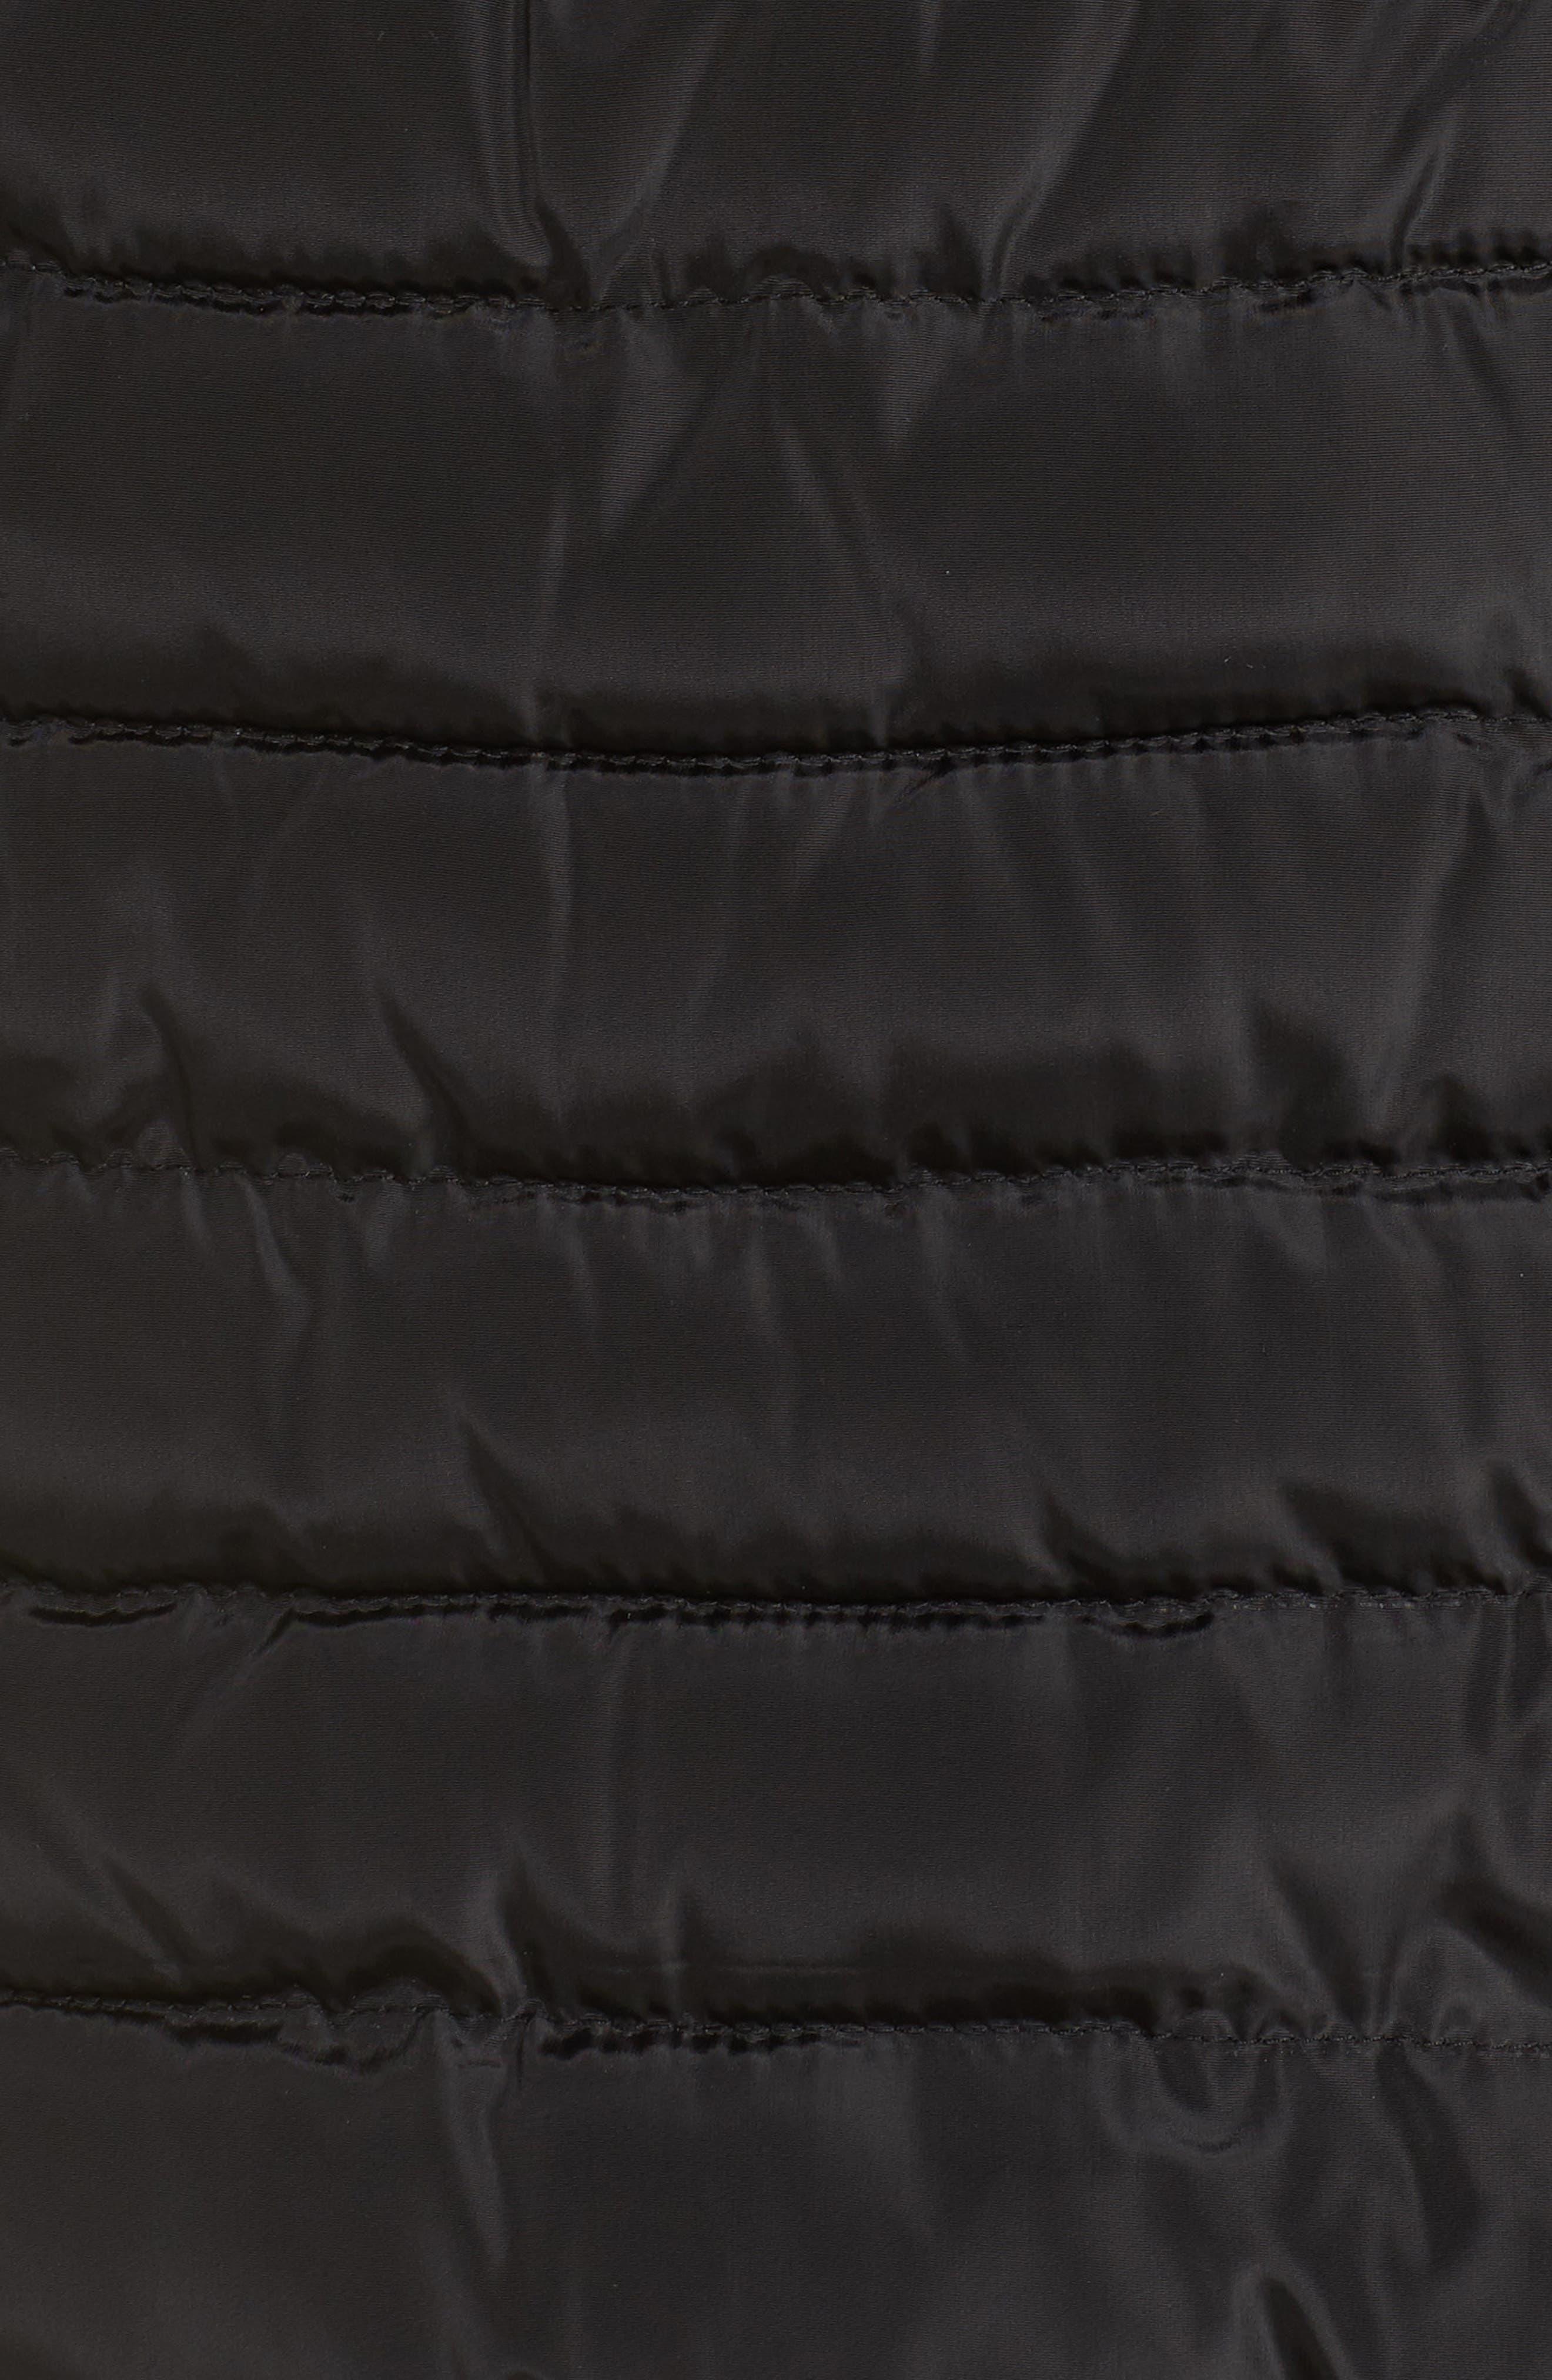 Matte Finish Puffer Coat,                             Alternate thumbnail 7, color,                             001